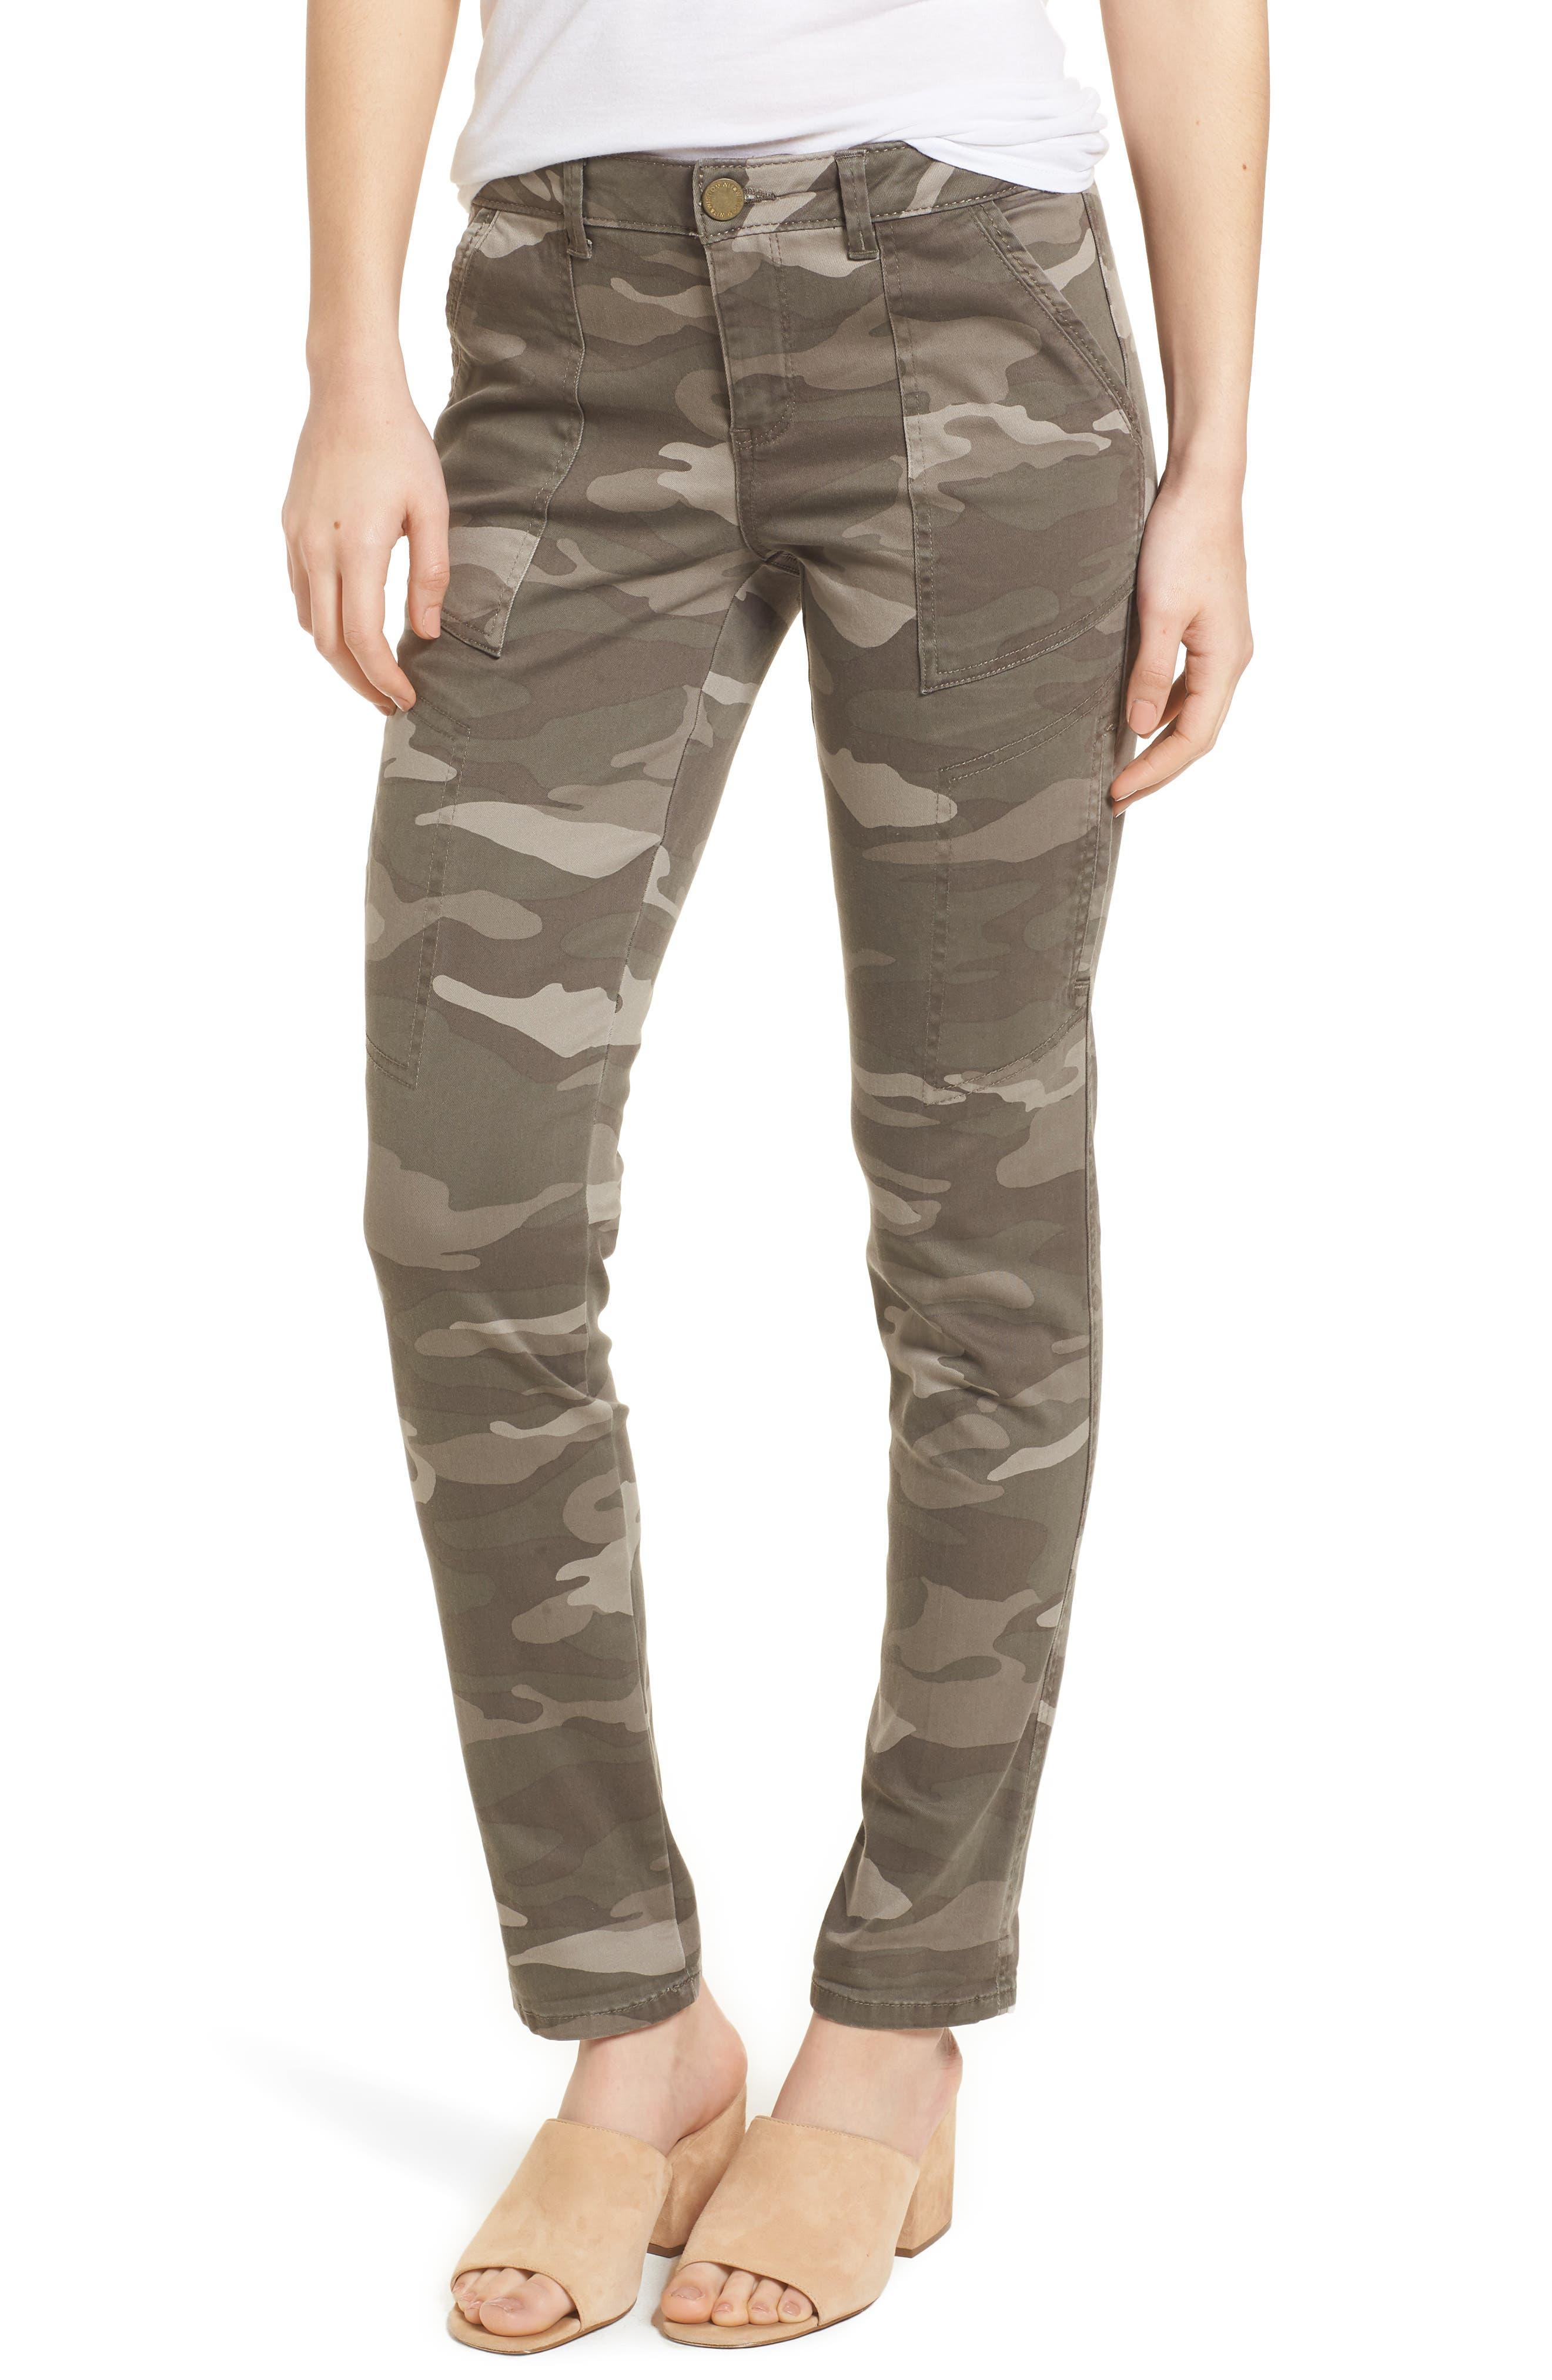 Twill Camo Cargo Pants,                         Main,                         color, Mr. Mushroom